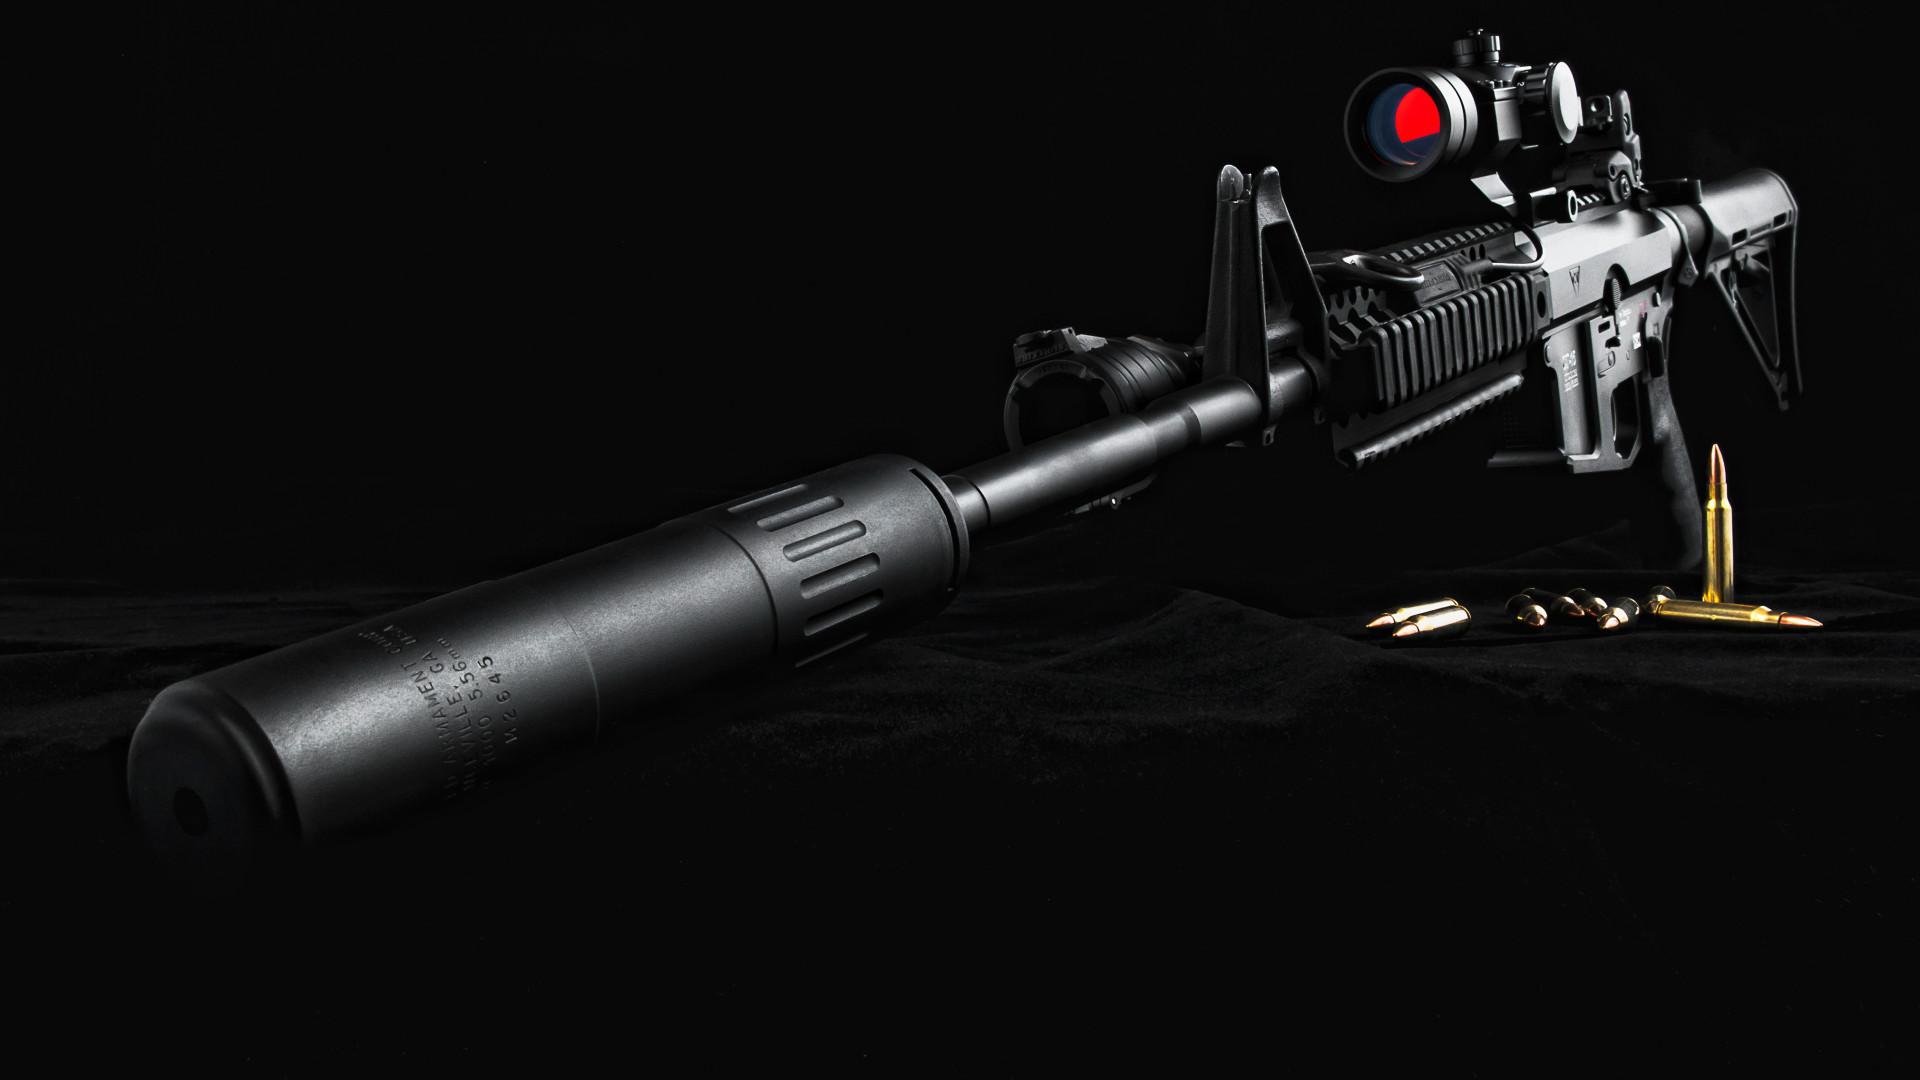 Kalashnikov Gun Wallpaper   kalashnikov gun wallpaper 1080p, kalashnikov  gun wallpaper desktop, kalashnikov gun wallpaper hd, kalashnikov gun wallp…